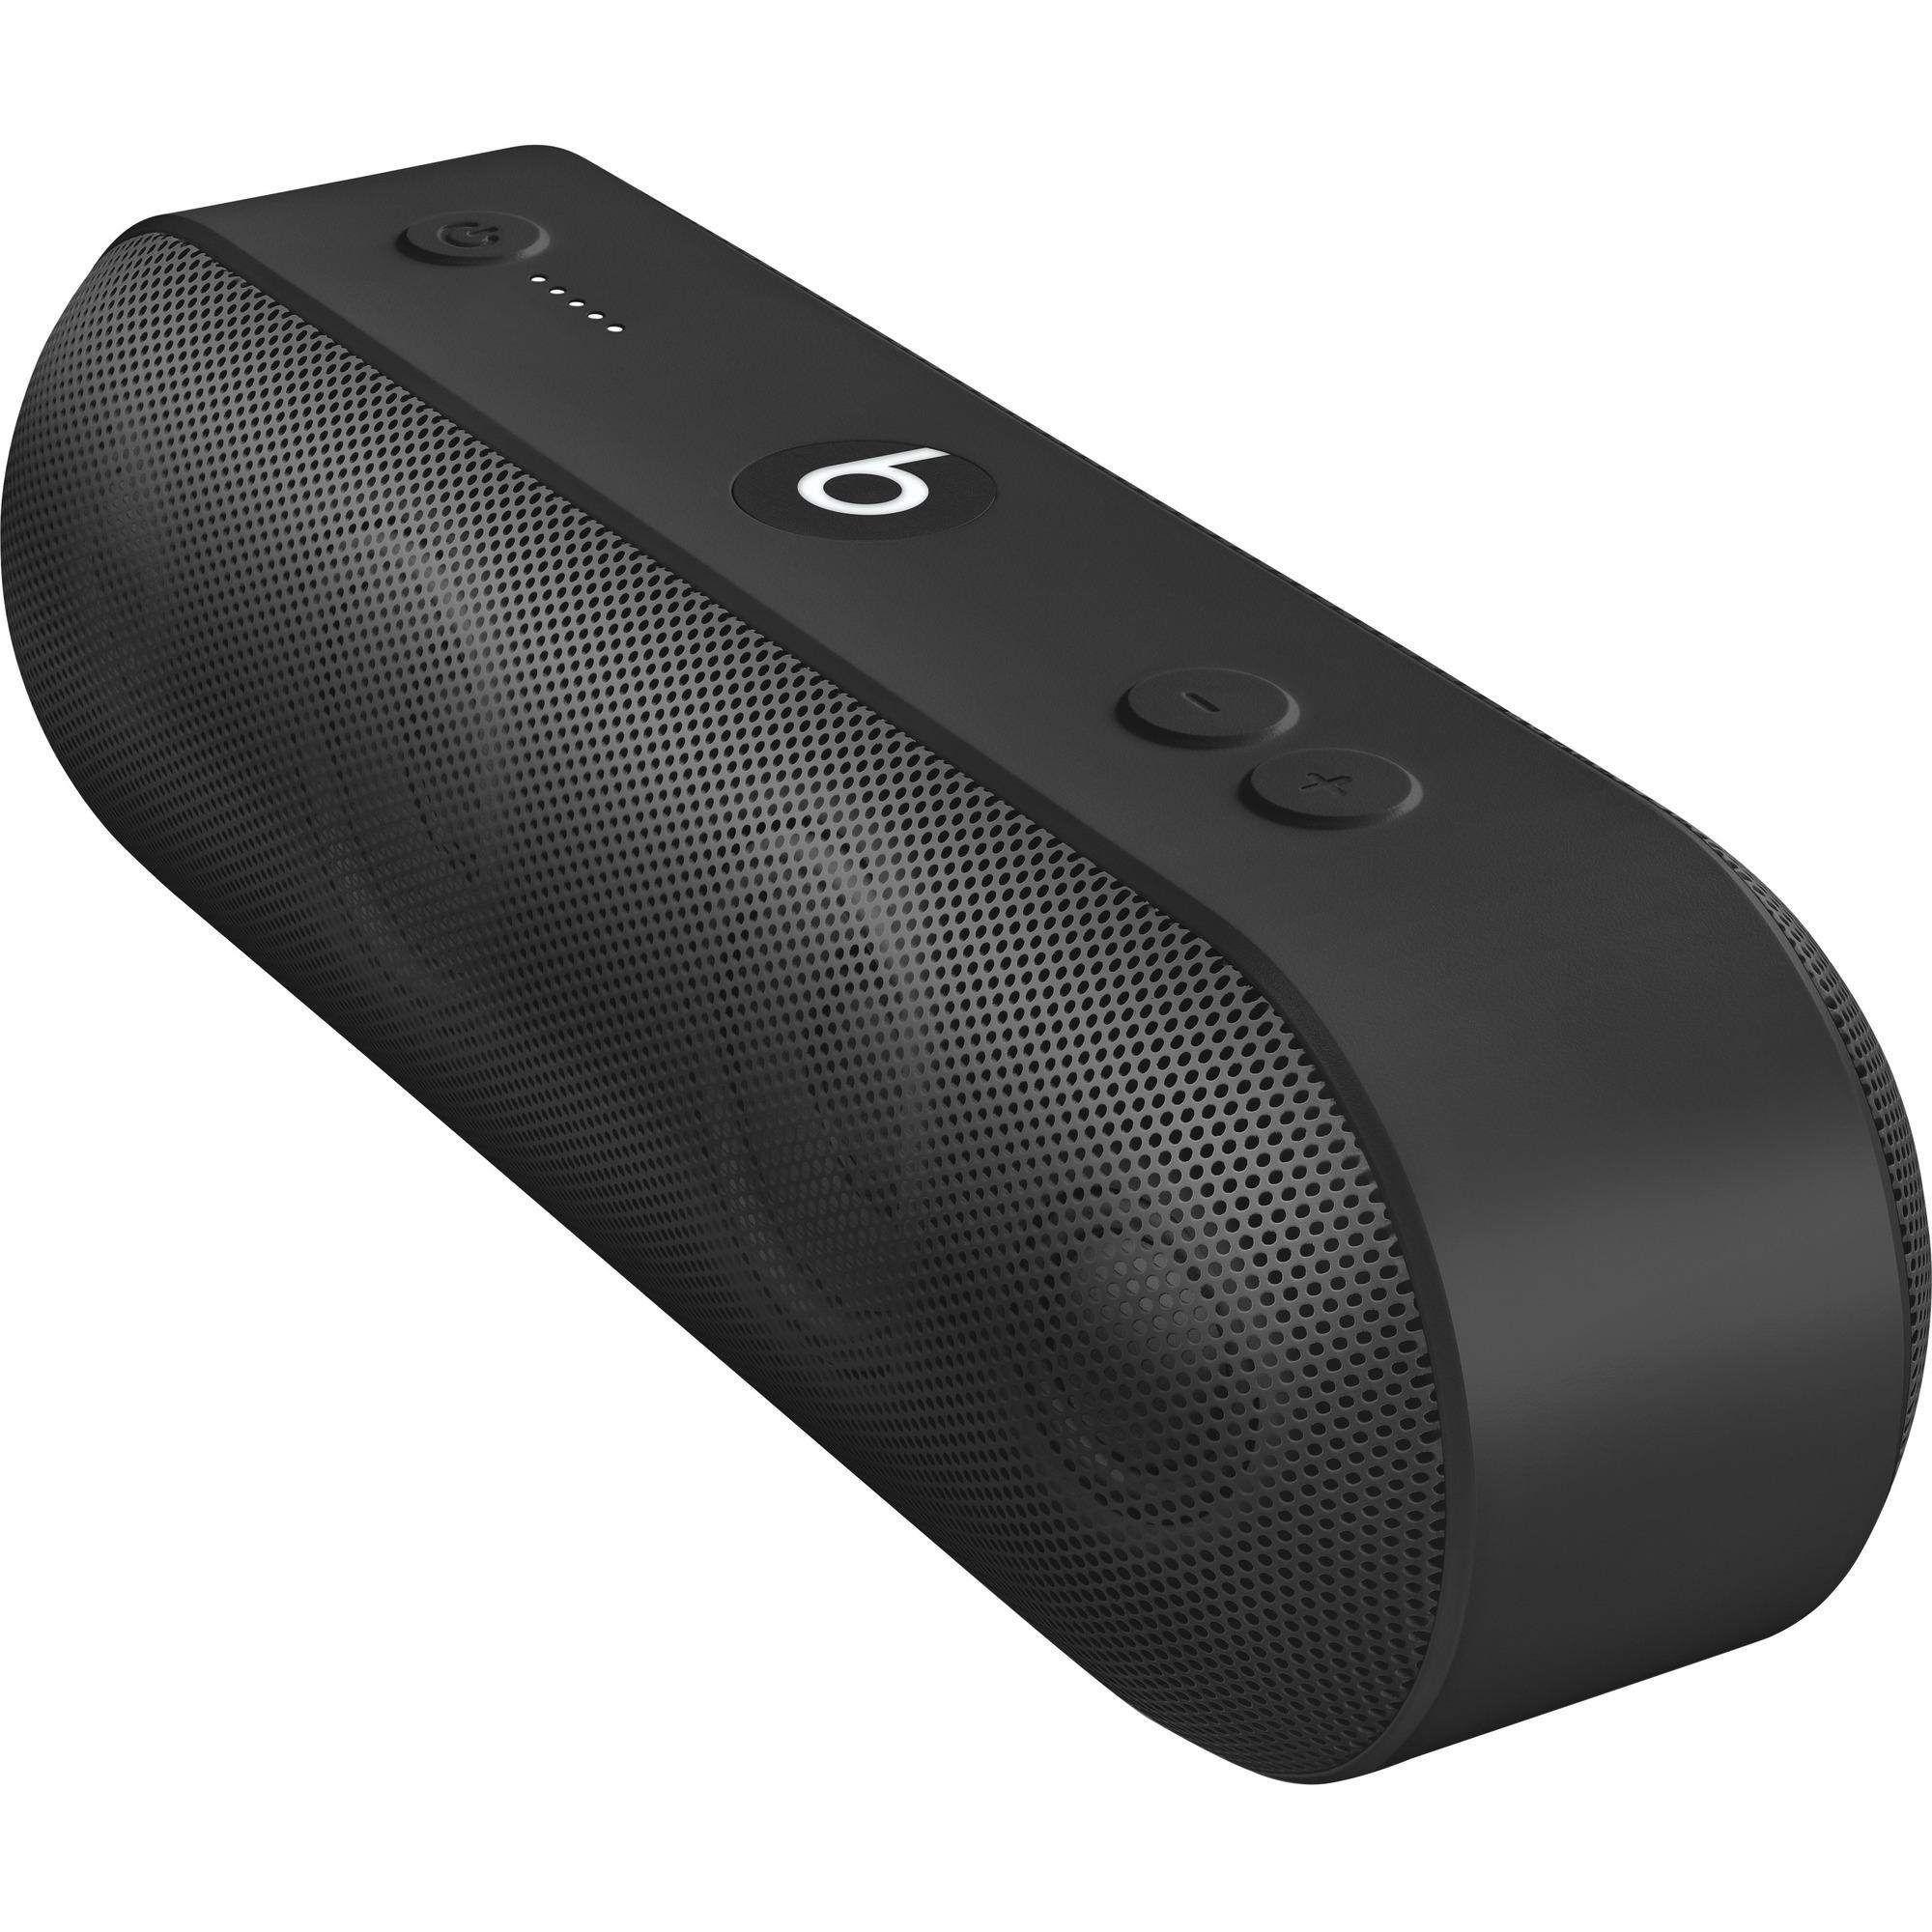 Apple Beats Pillplus Speaker System - Wireless Speakers - Portable - Battery Rechargeable - Black